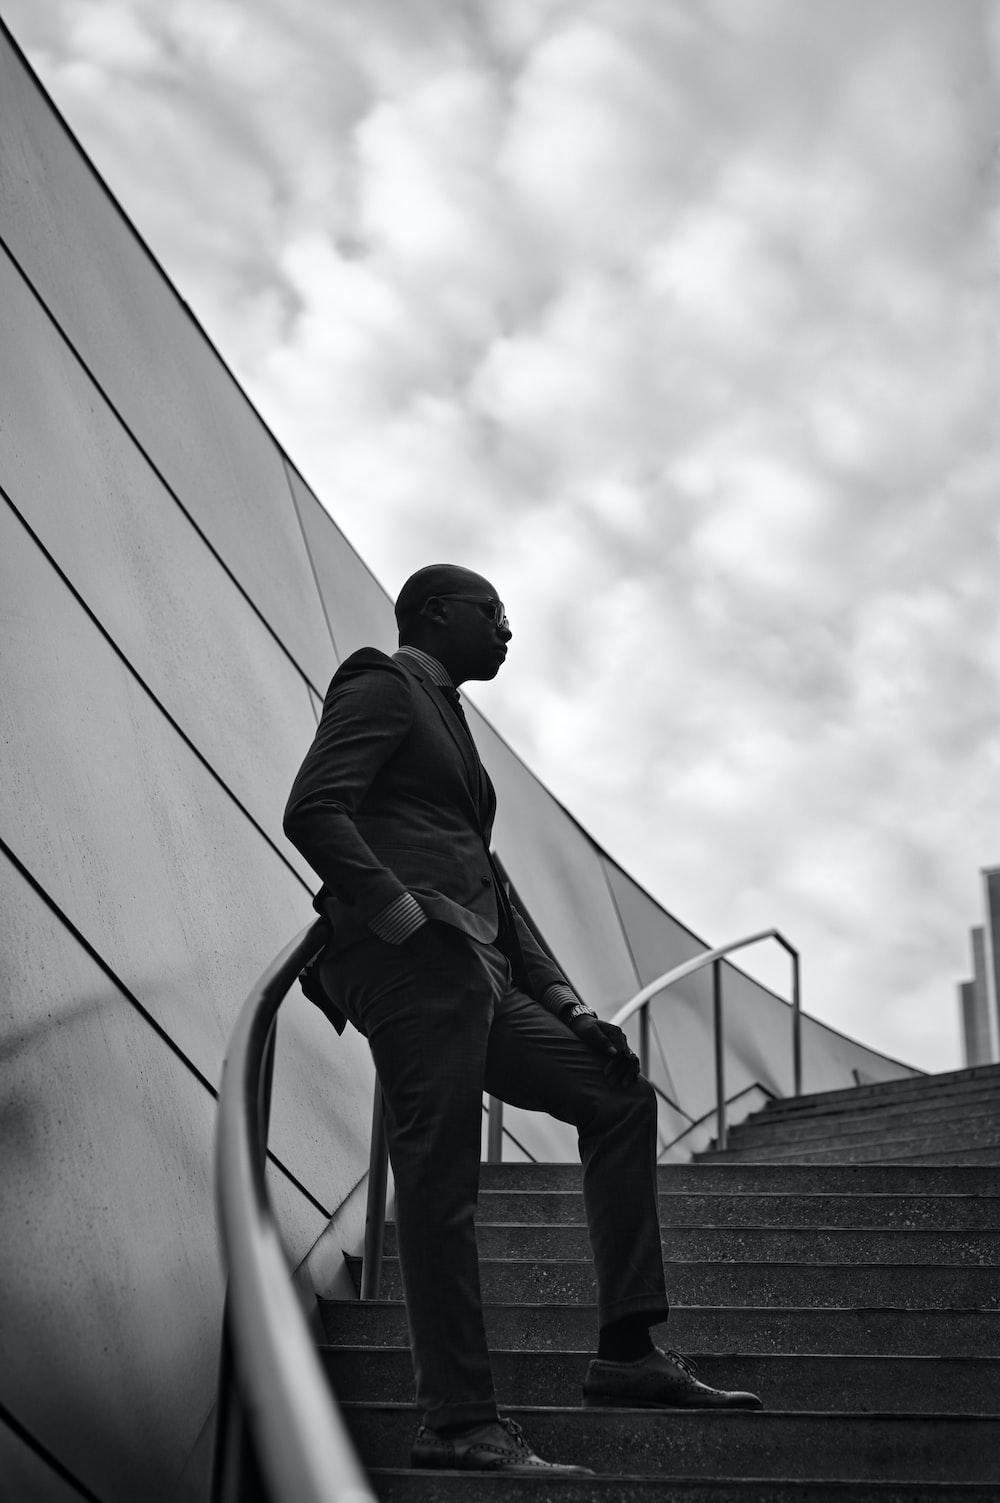 man in black jacket and black pants walking on stairs